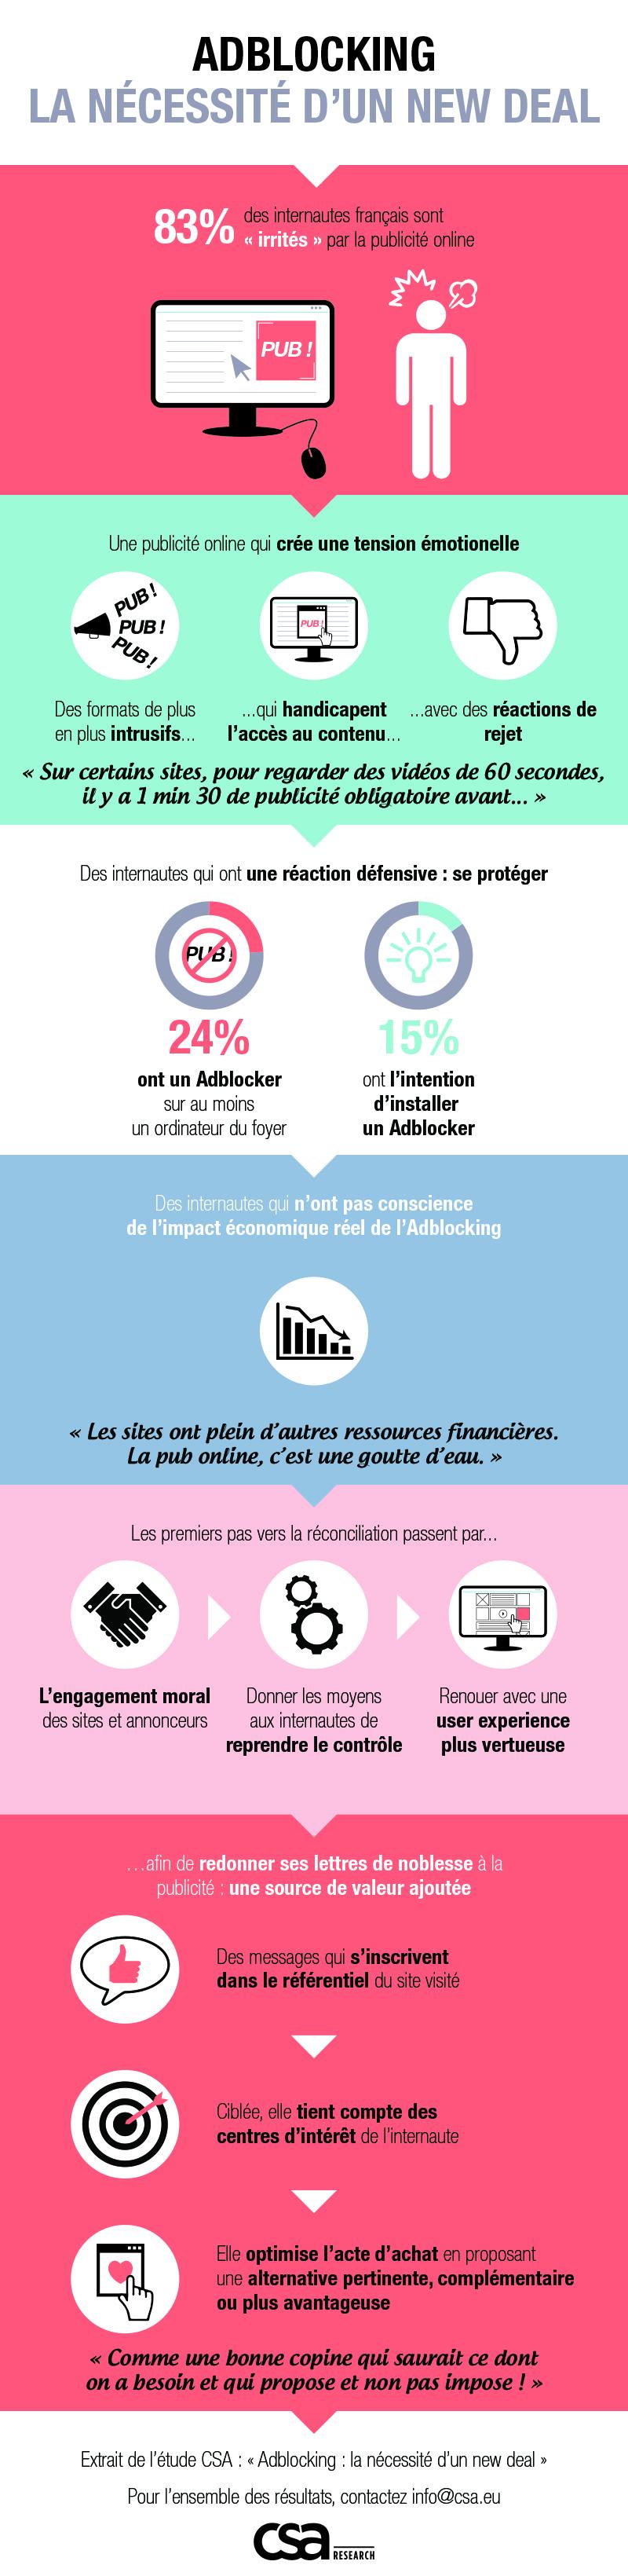 infographie-adblocking-CSA